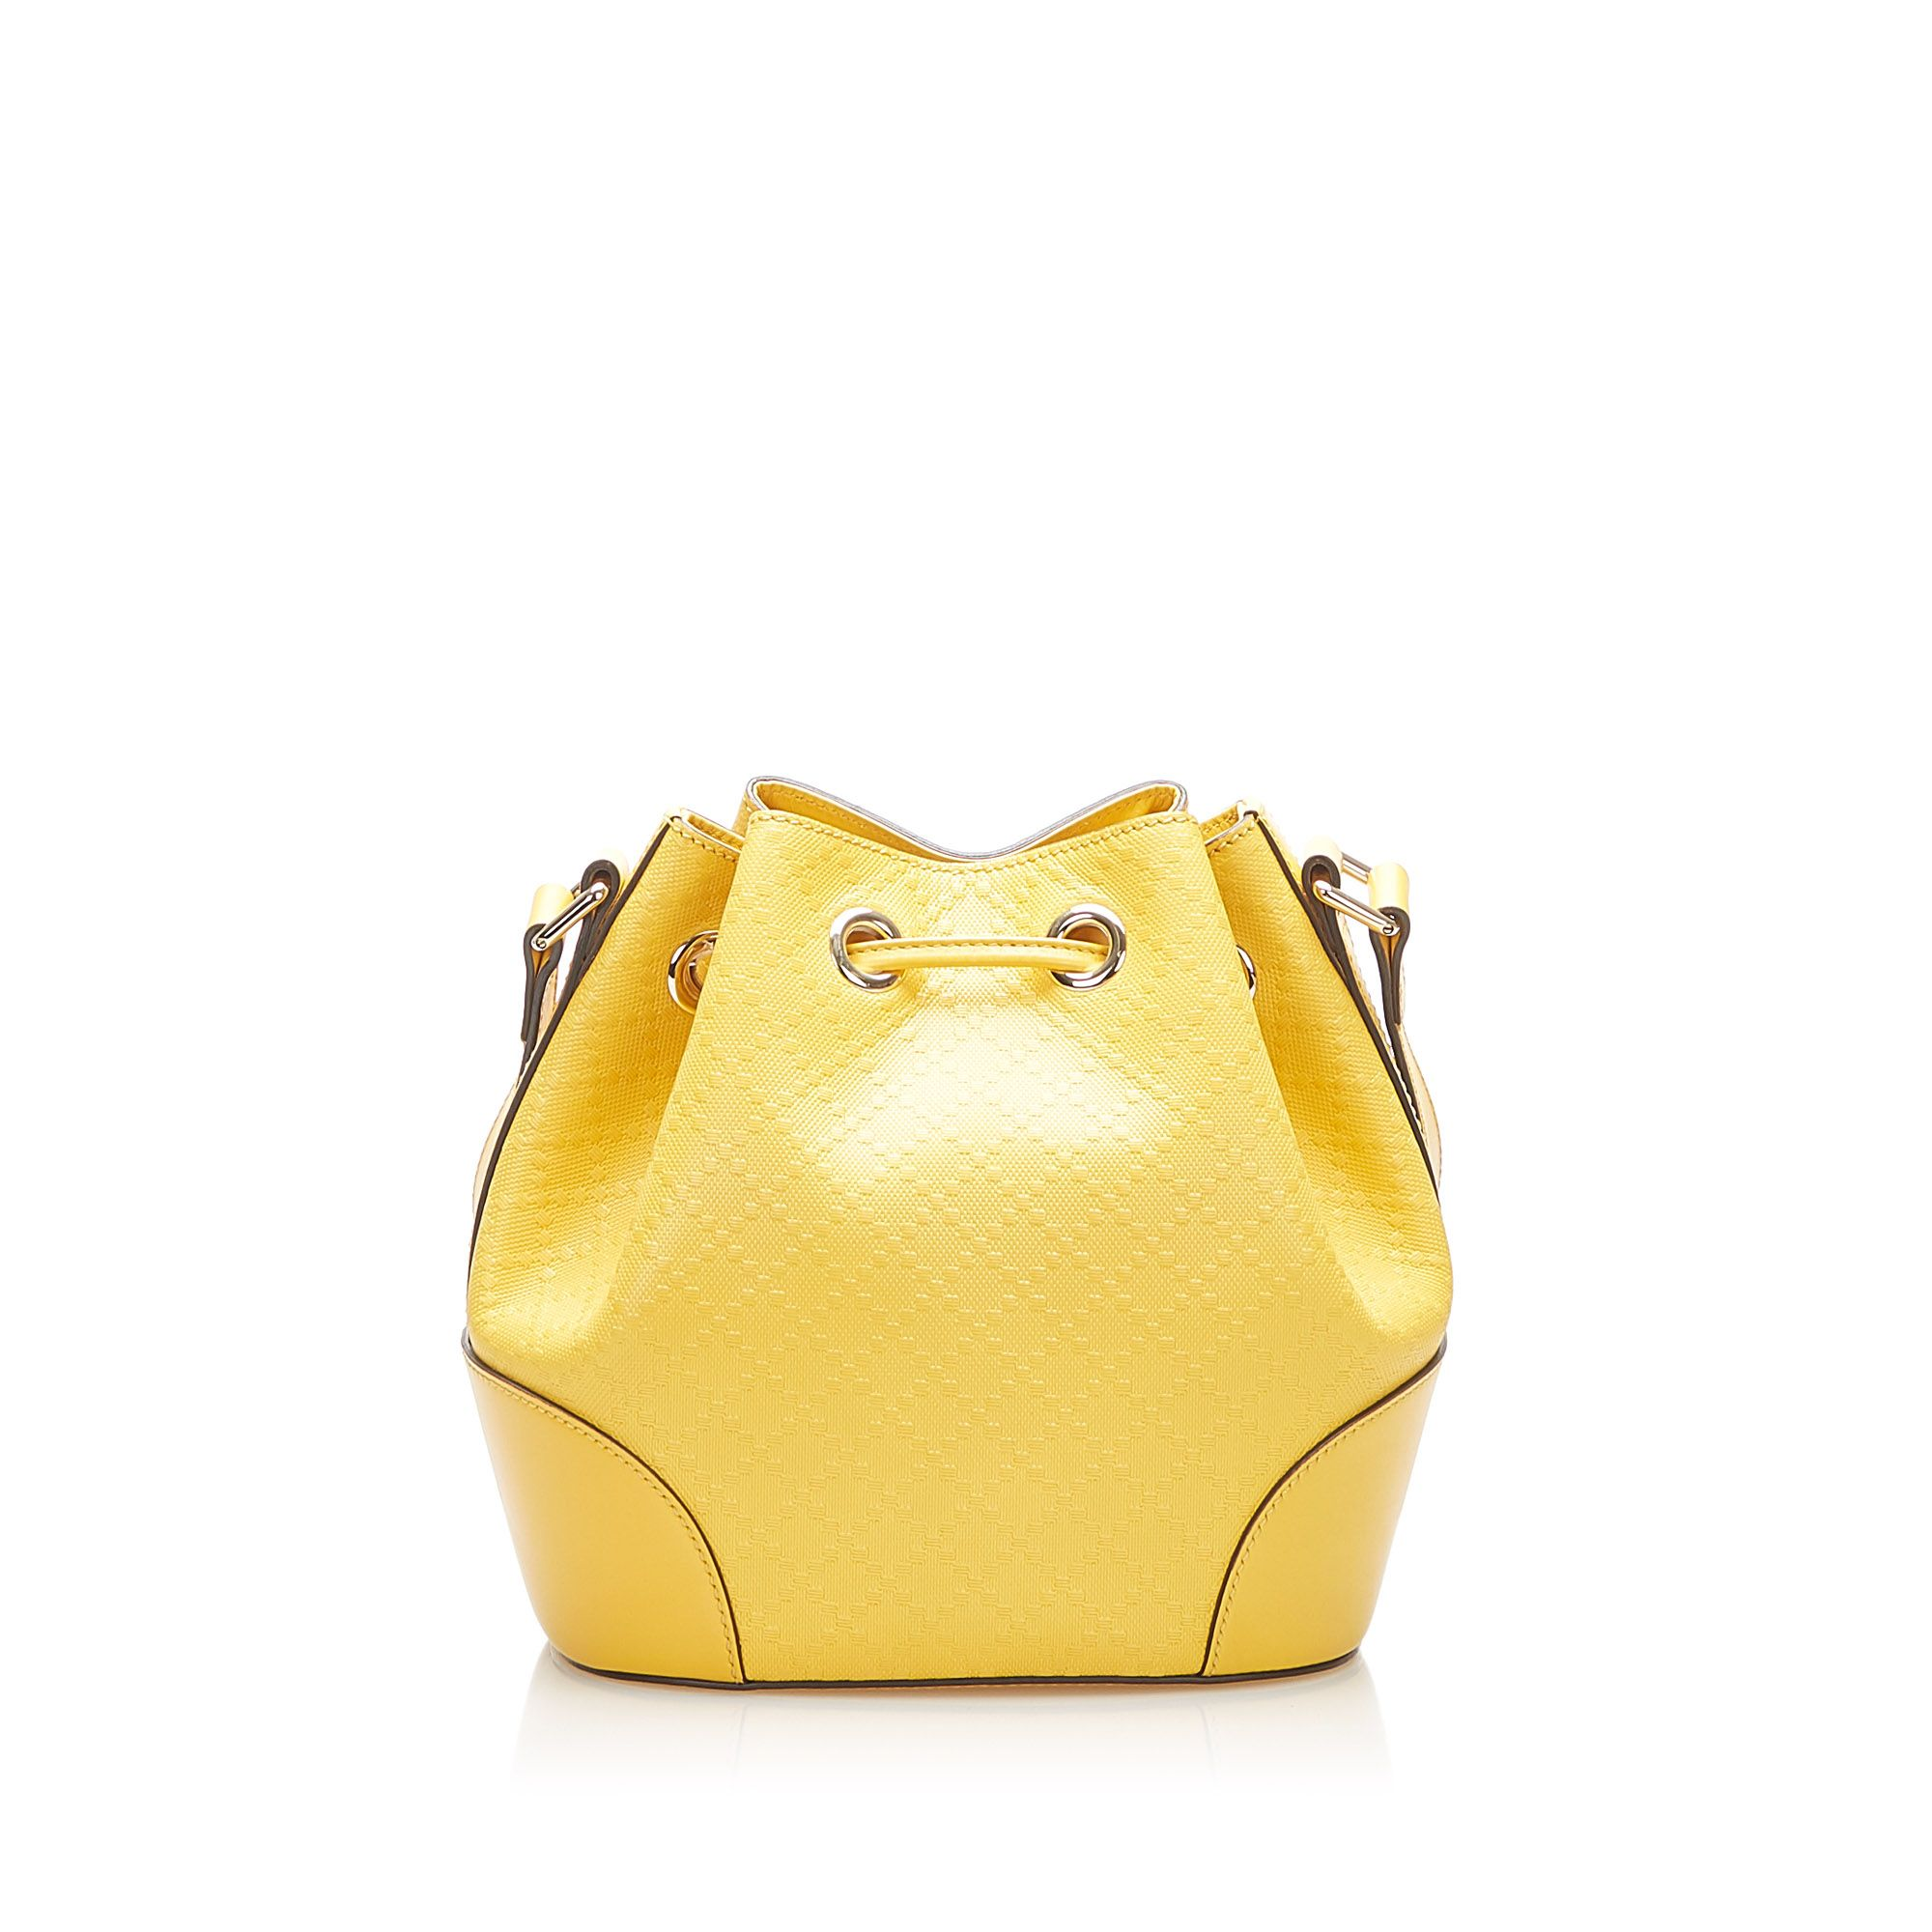 Vintage Gucci Diamante Bright Leather Bucket Bag Yellow